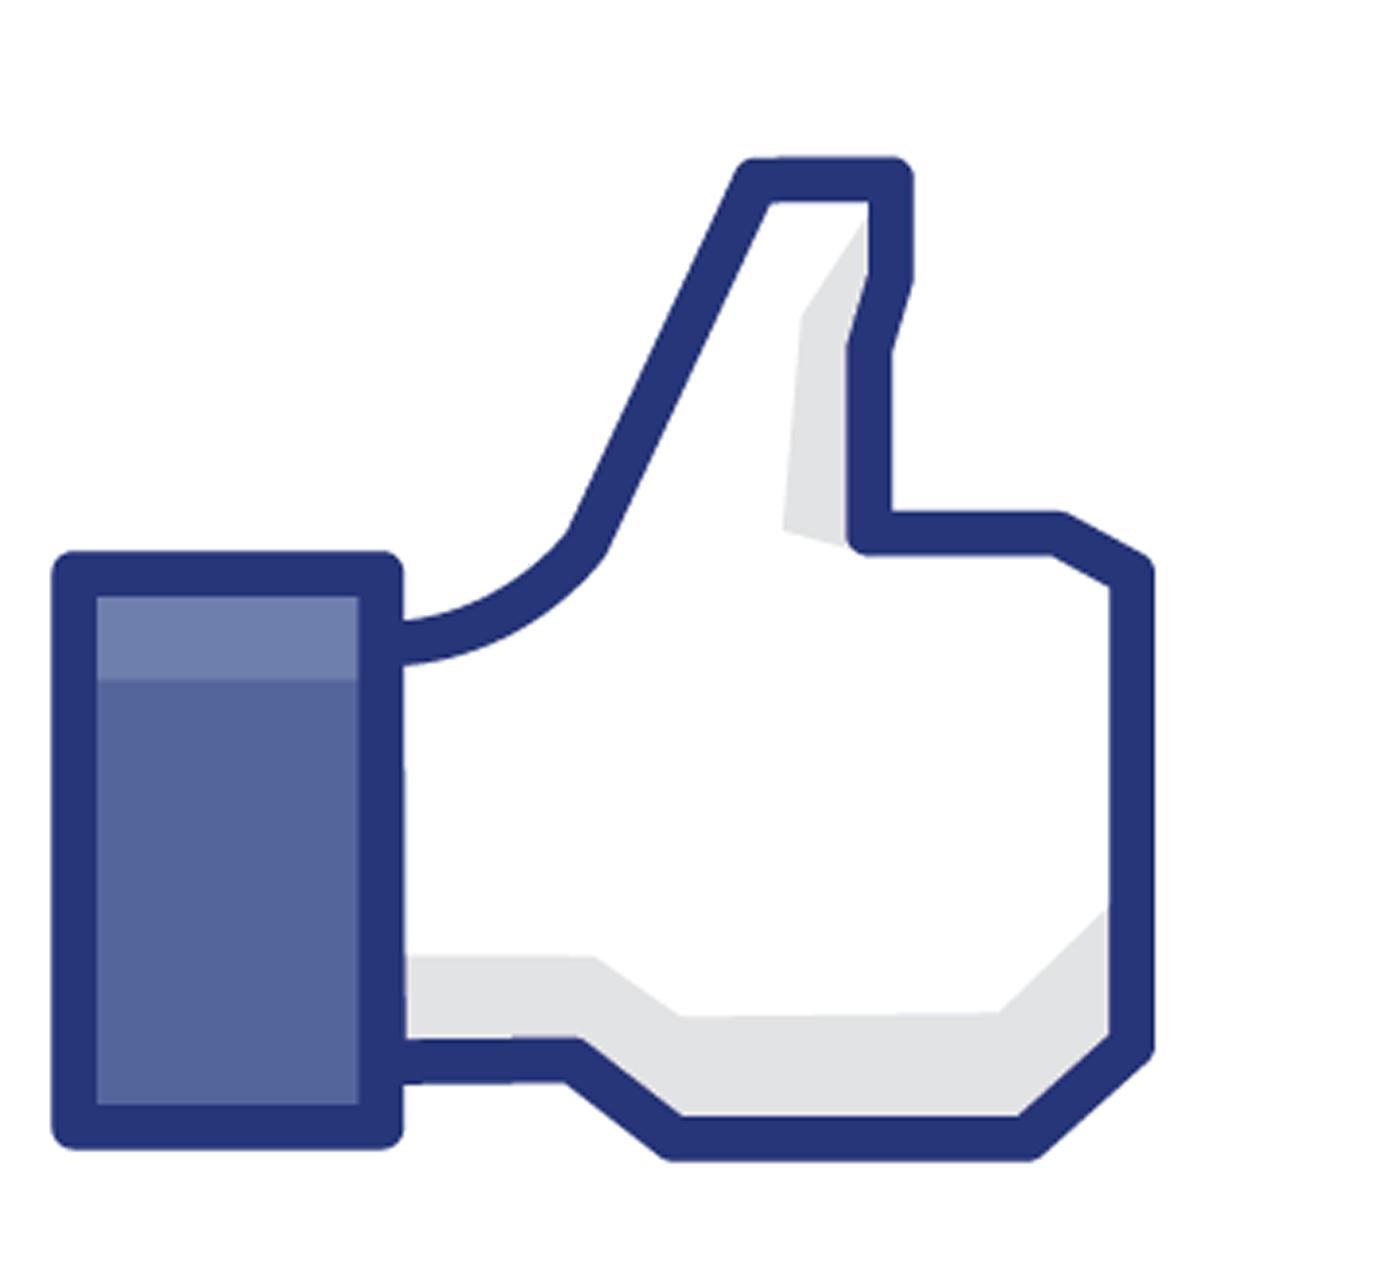 Facebook clipart sizes clip art Facebook PNG Images Transparent Free Download | PNGMart.com clip art